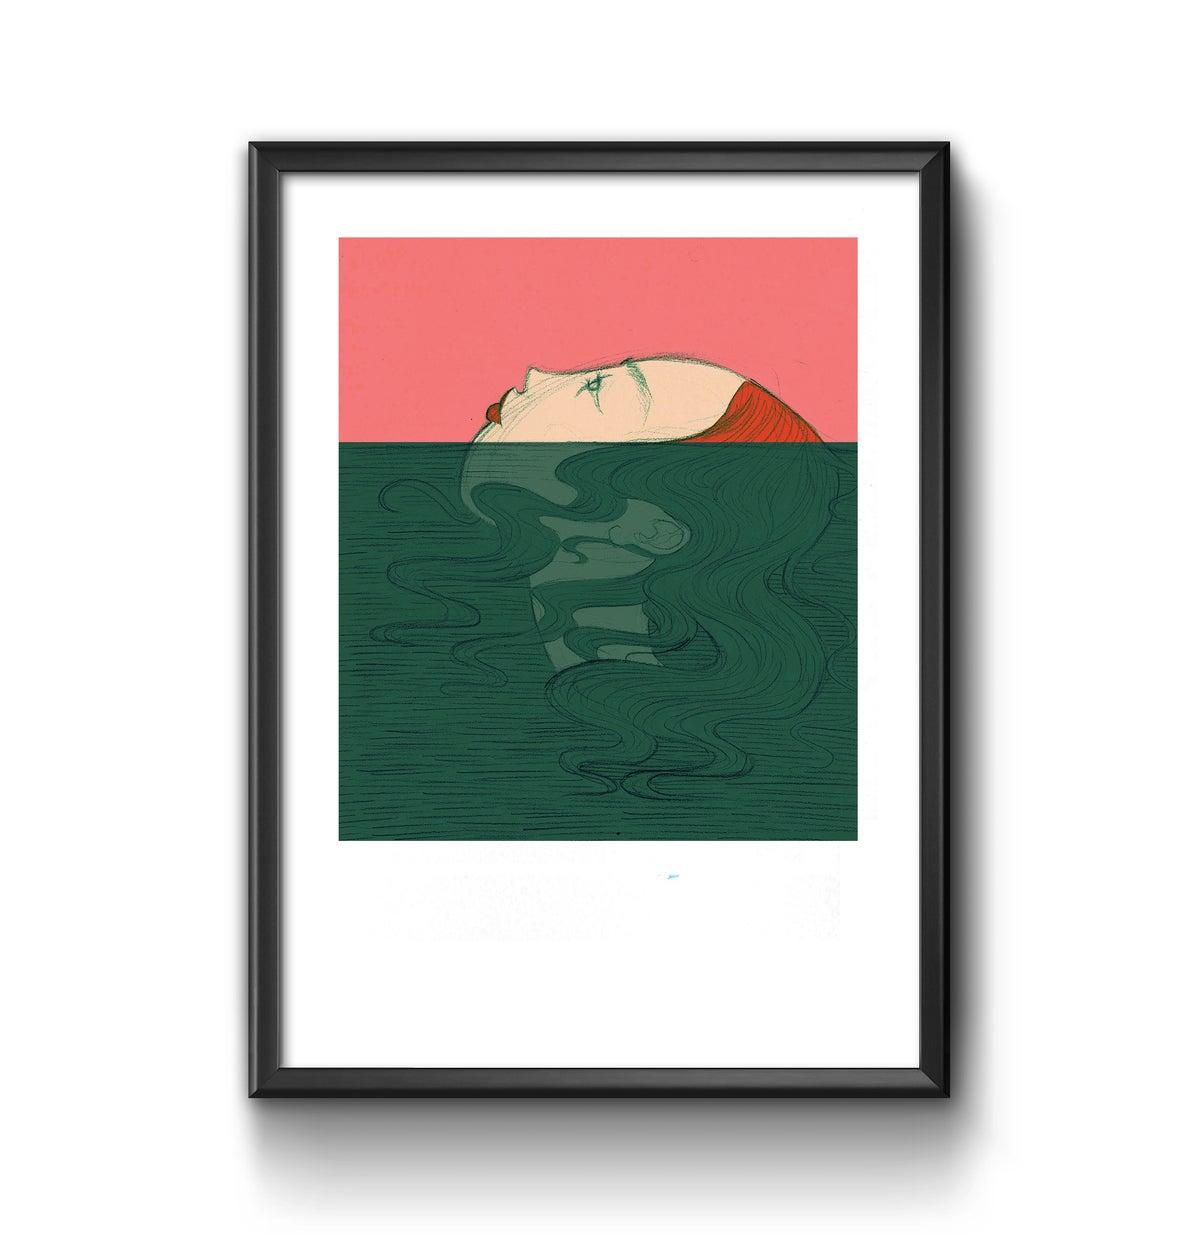 Image of Float - Moira Scicluna Zahra